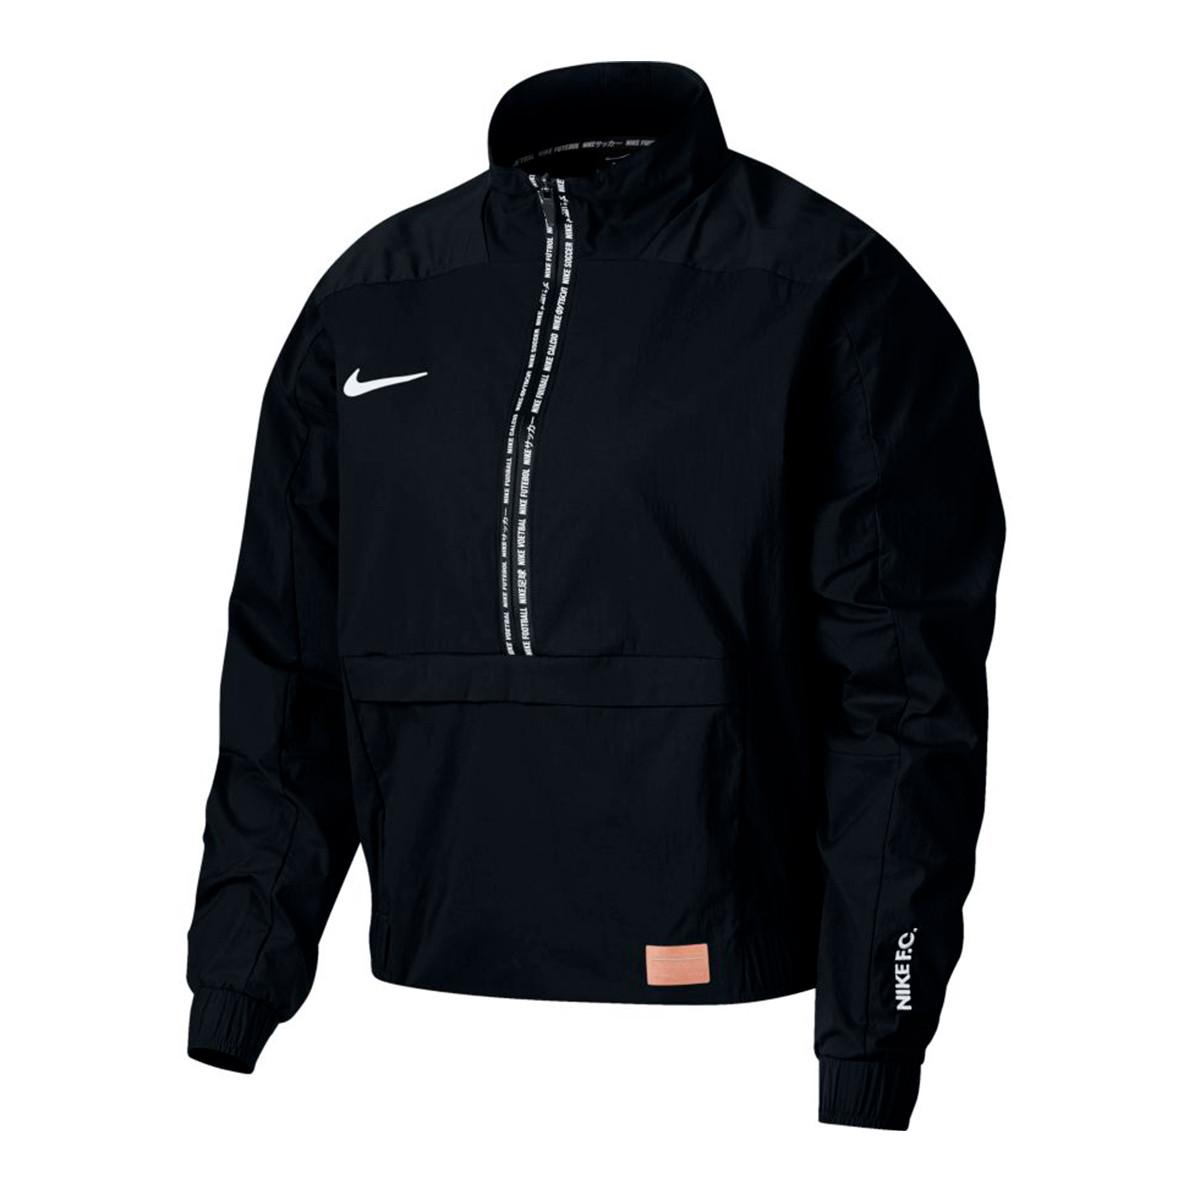 sostén atómico Médico  Jacket Nike Dry Nike F.C. Midlayer QZ Mujer Black - Football store Fútbol  Emotion